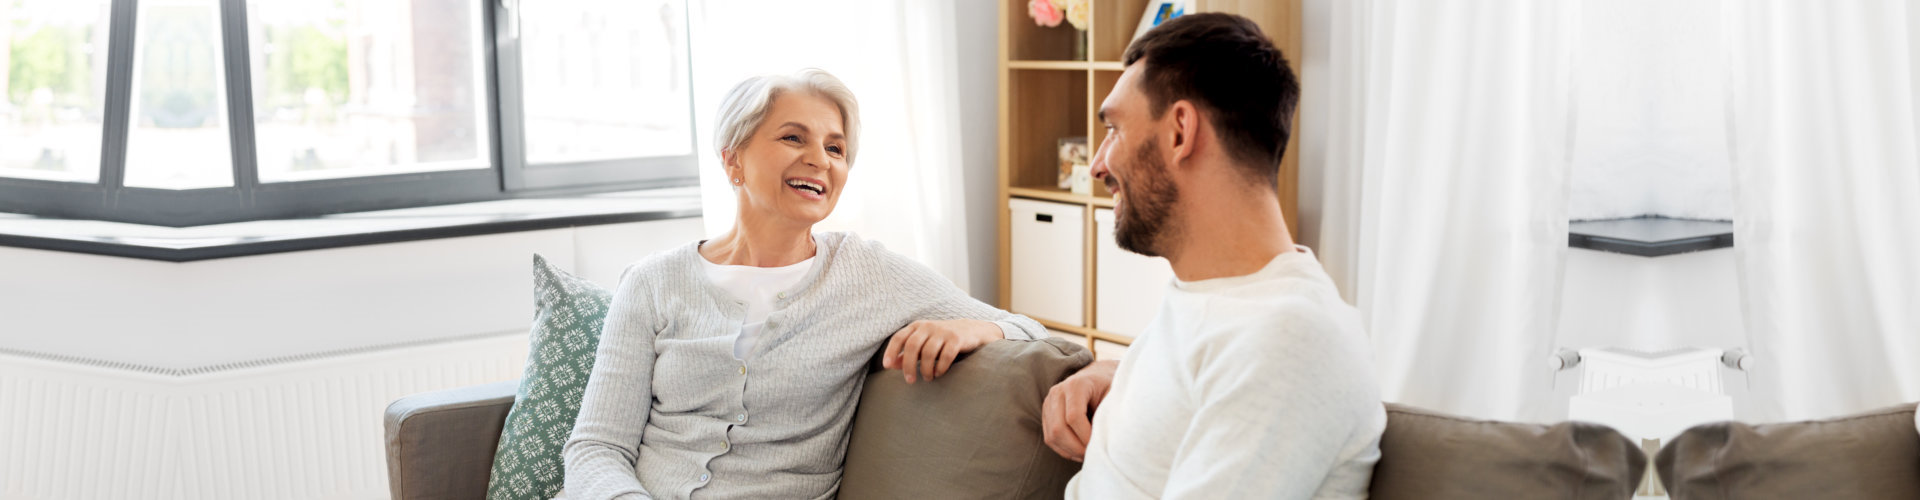 caregiver and senior woman having a conversation